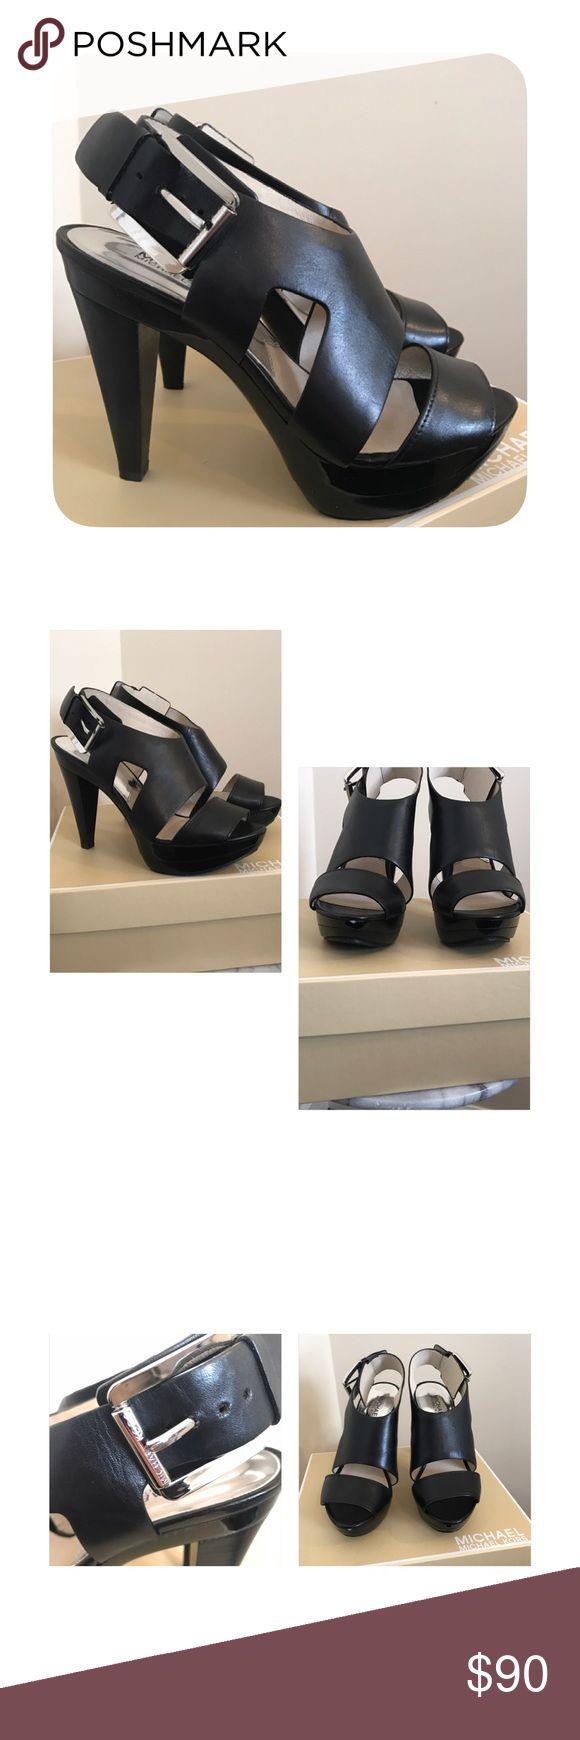 "⭐️New listing⭐️ NIB Michael Kors heel 7.5❤️ New in the box, only worn in store. Black leather Michael Kors sandal heel size 7.5. 4"" wooden heel. Beautiful shoes! ❤️ Michael Kors Shoes Heels"